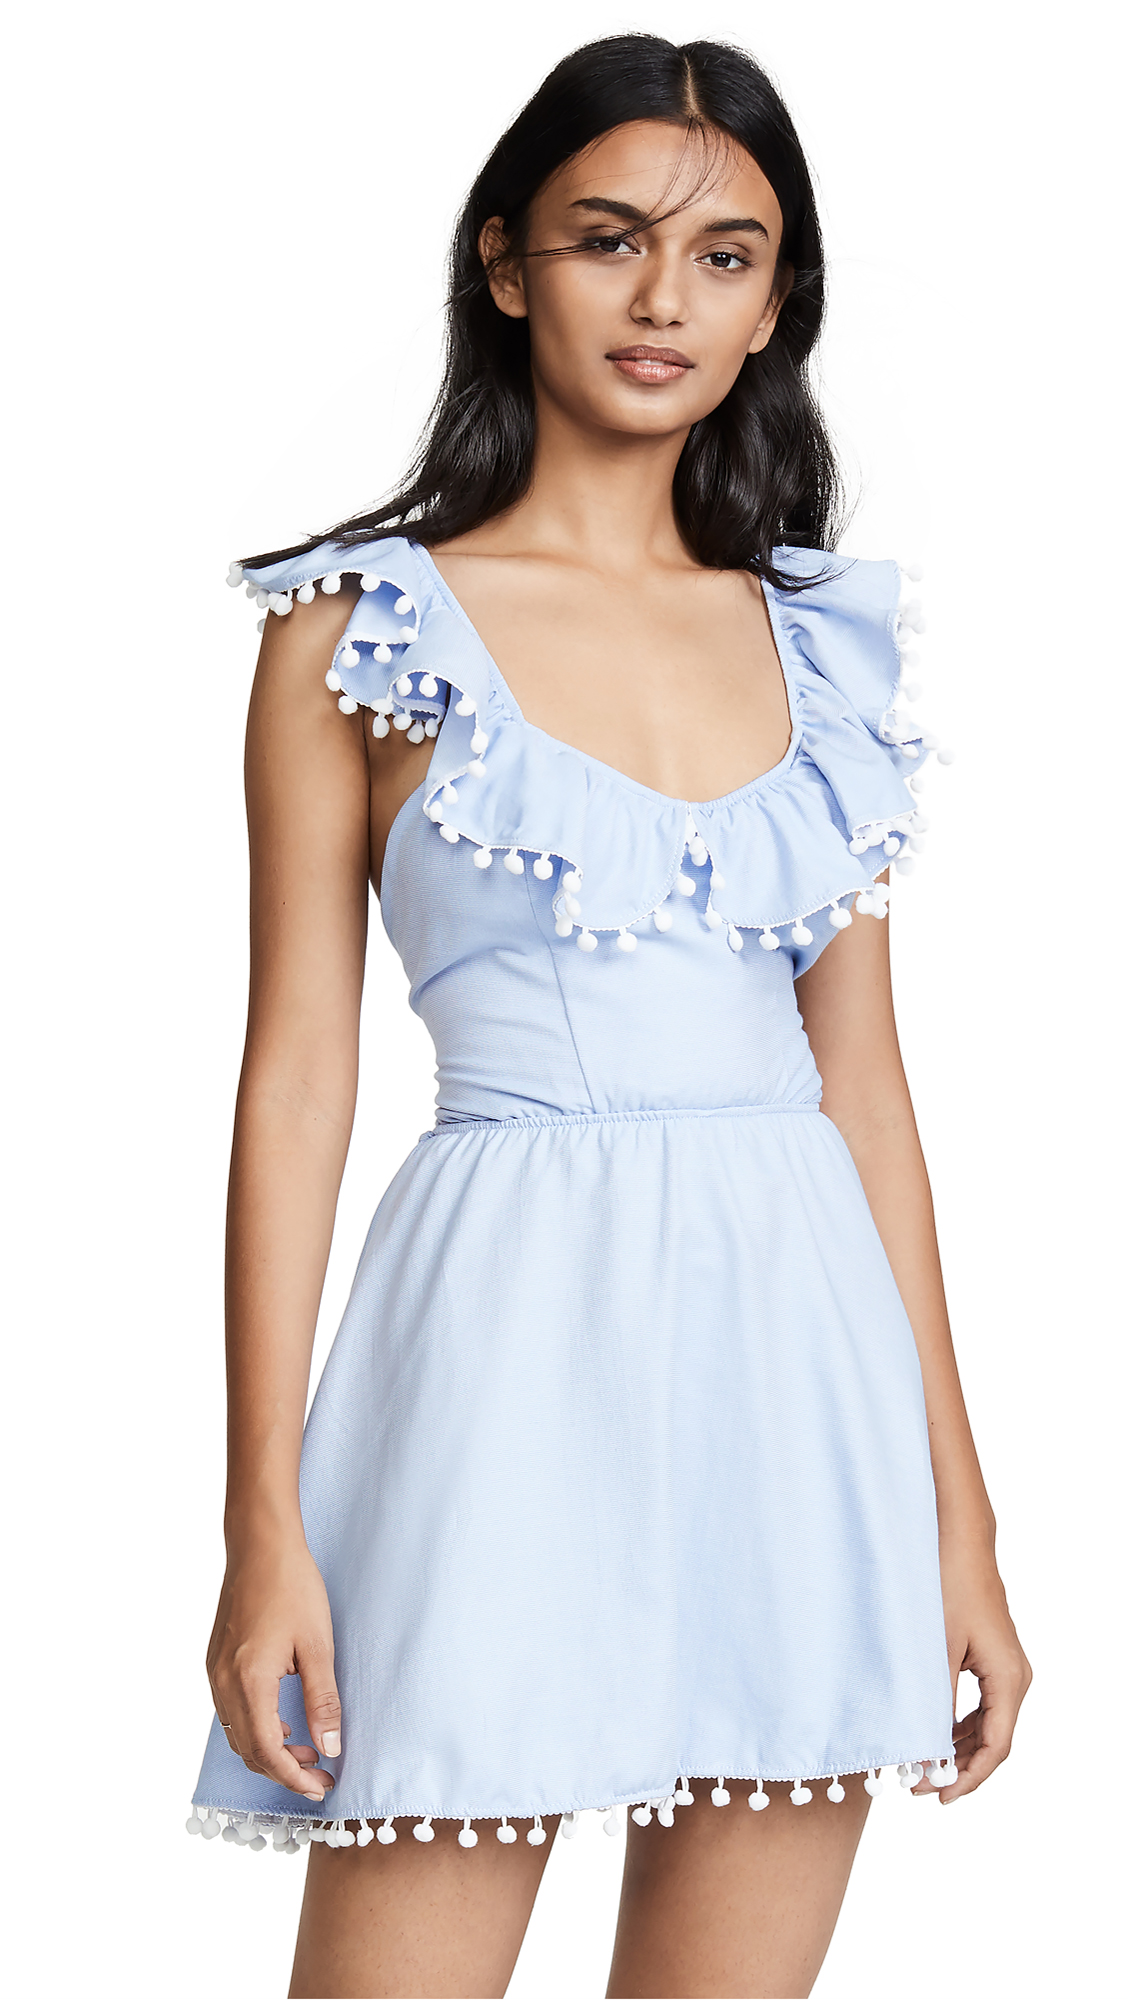 PEIXOTO Lara Dress in Sky Blue